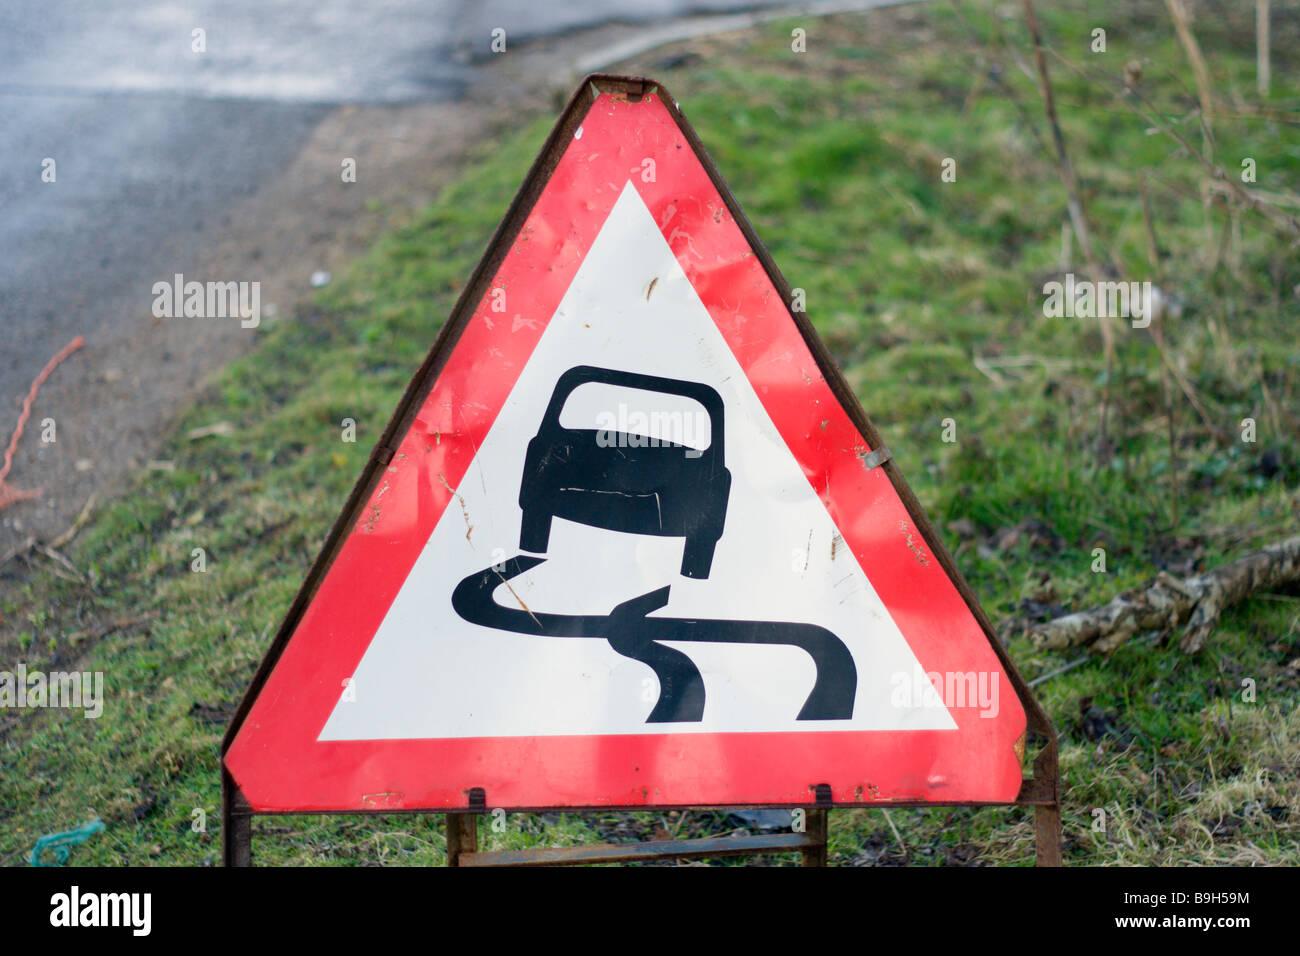 Advertencia resbalosa roadsign Imagen De Stock